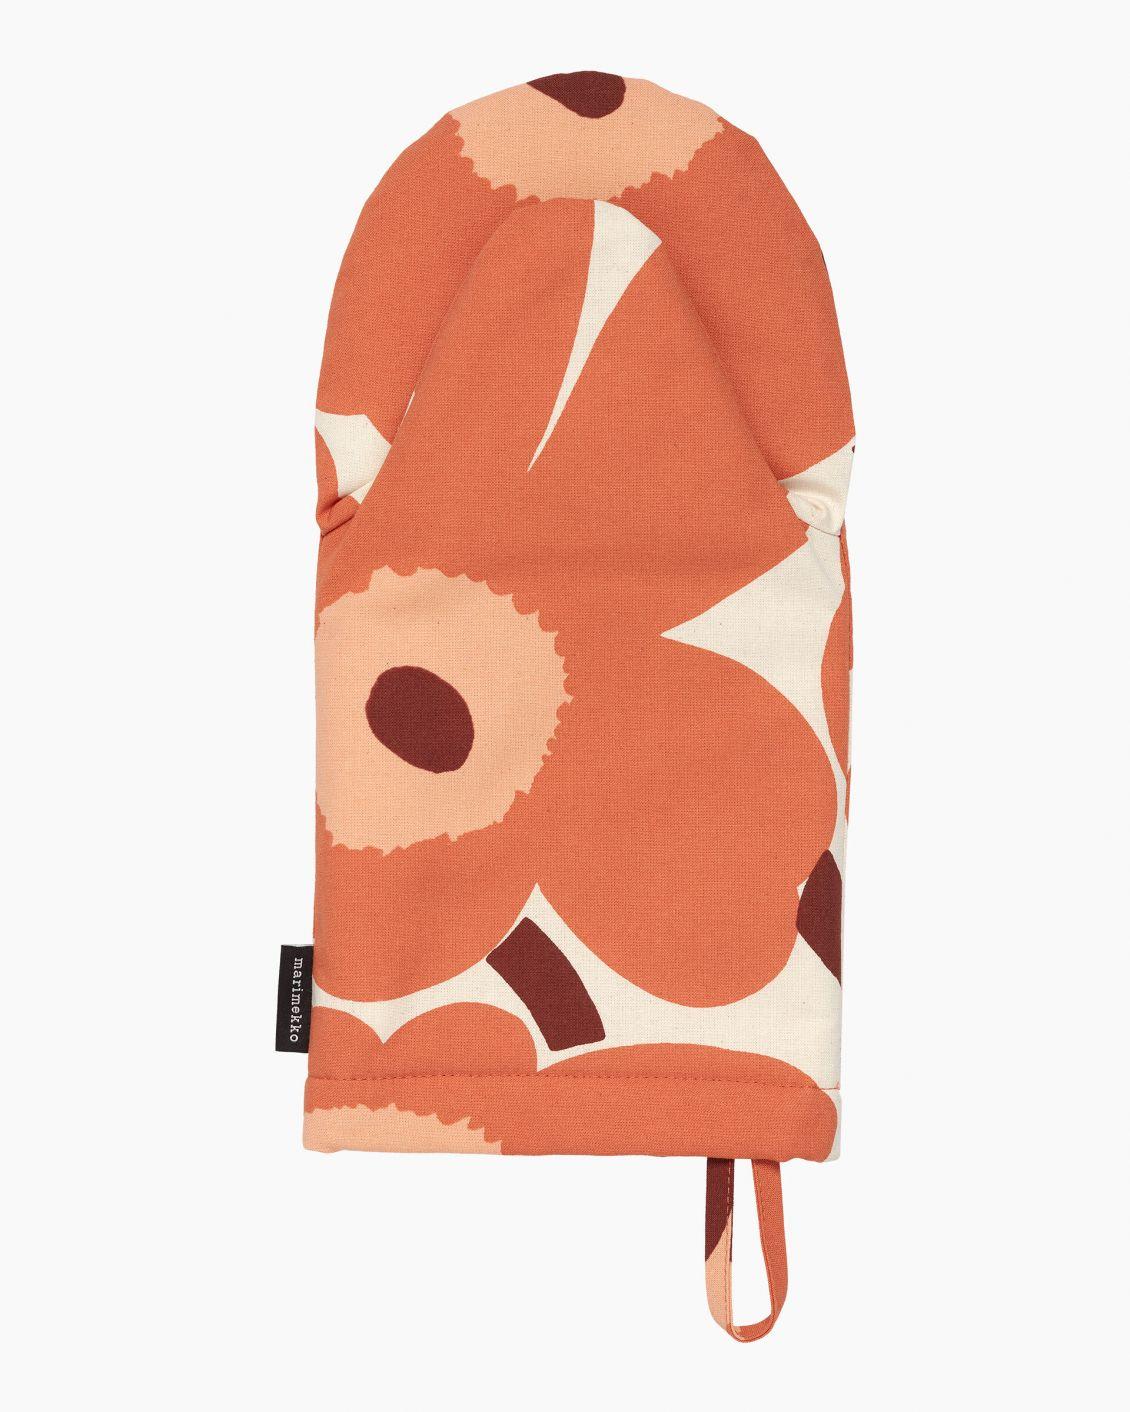 Manique gant Pieni Unikko Flower rouille/orangé/bordeaux * Marimekko